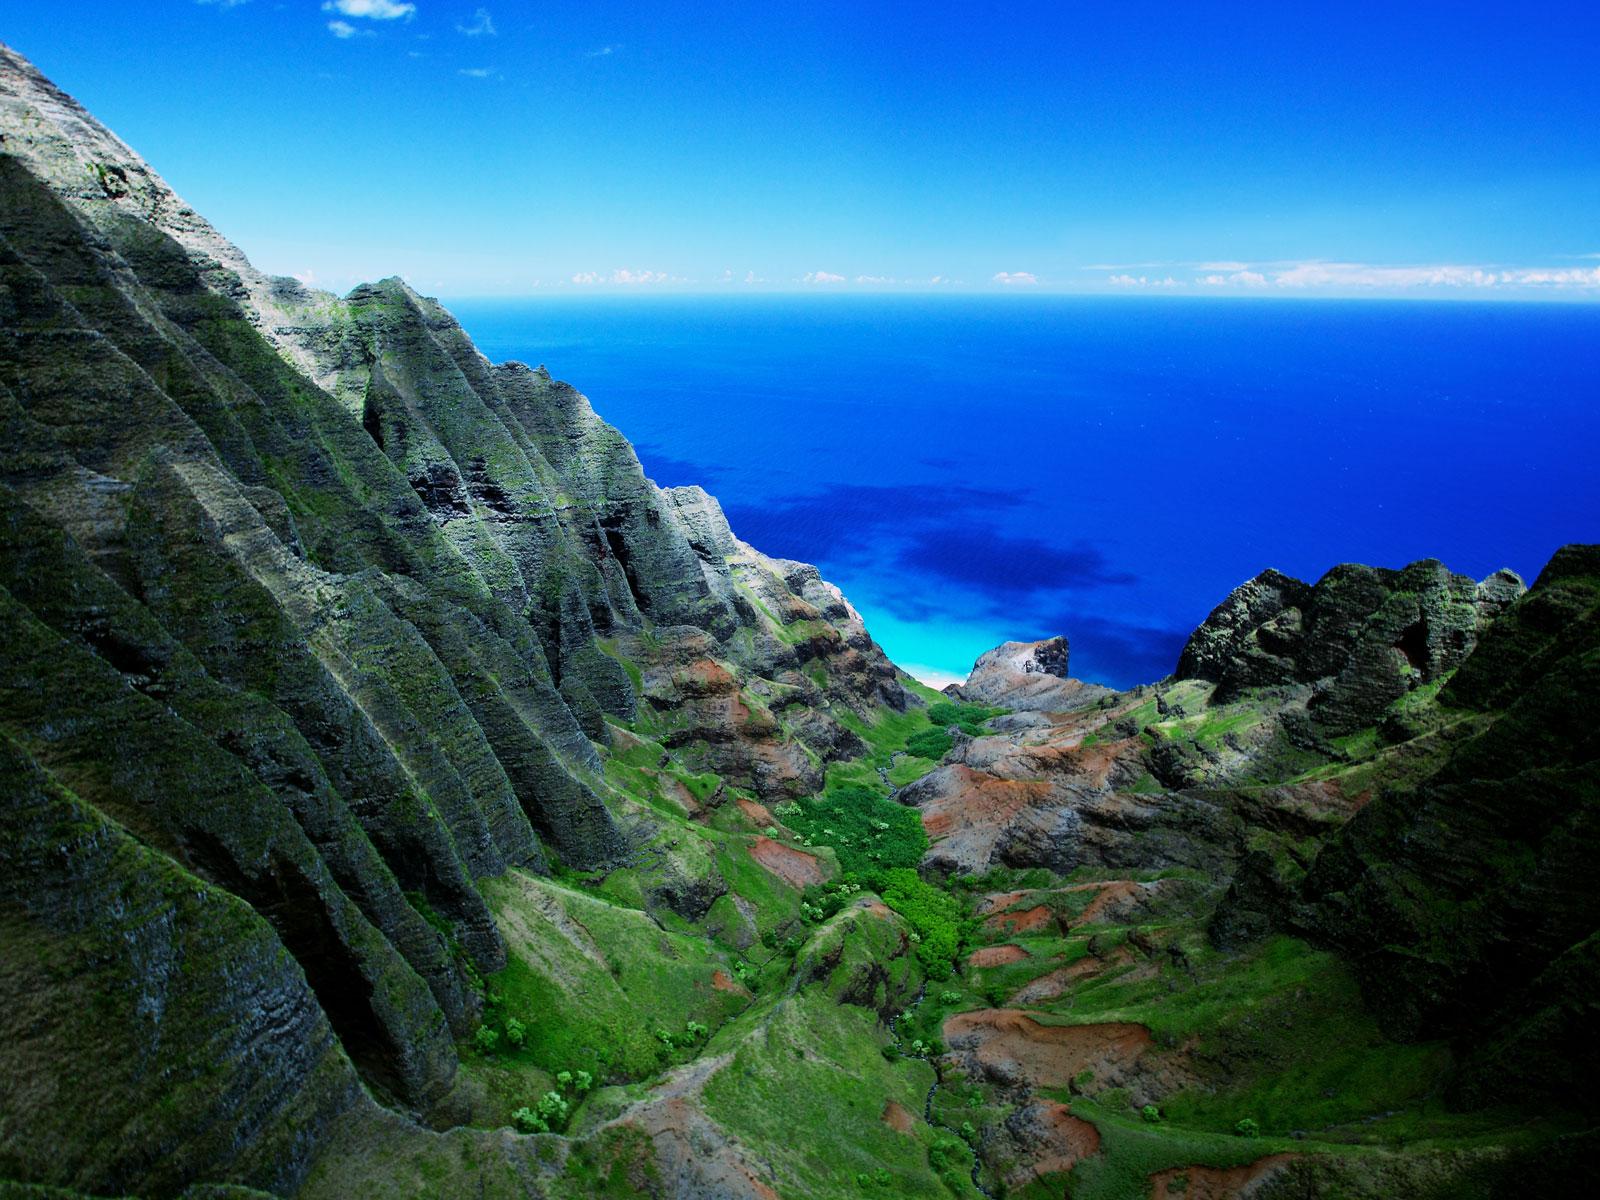 7 Reasons You Must Add Kauai to Your Hawaii Holiday  Travel Insider